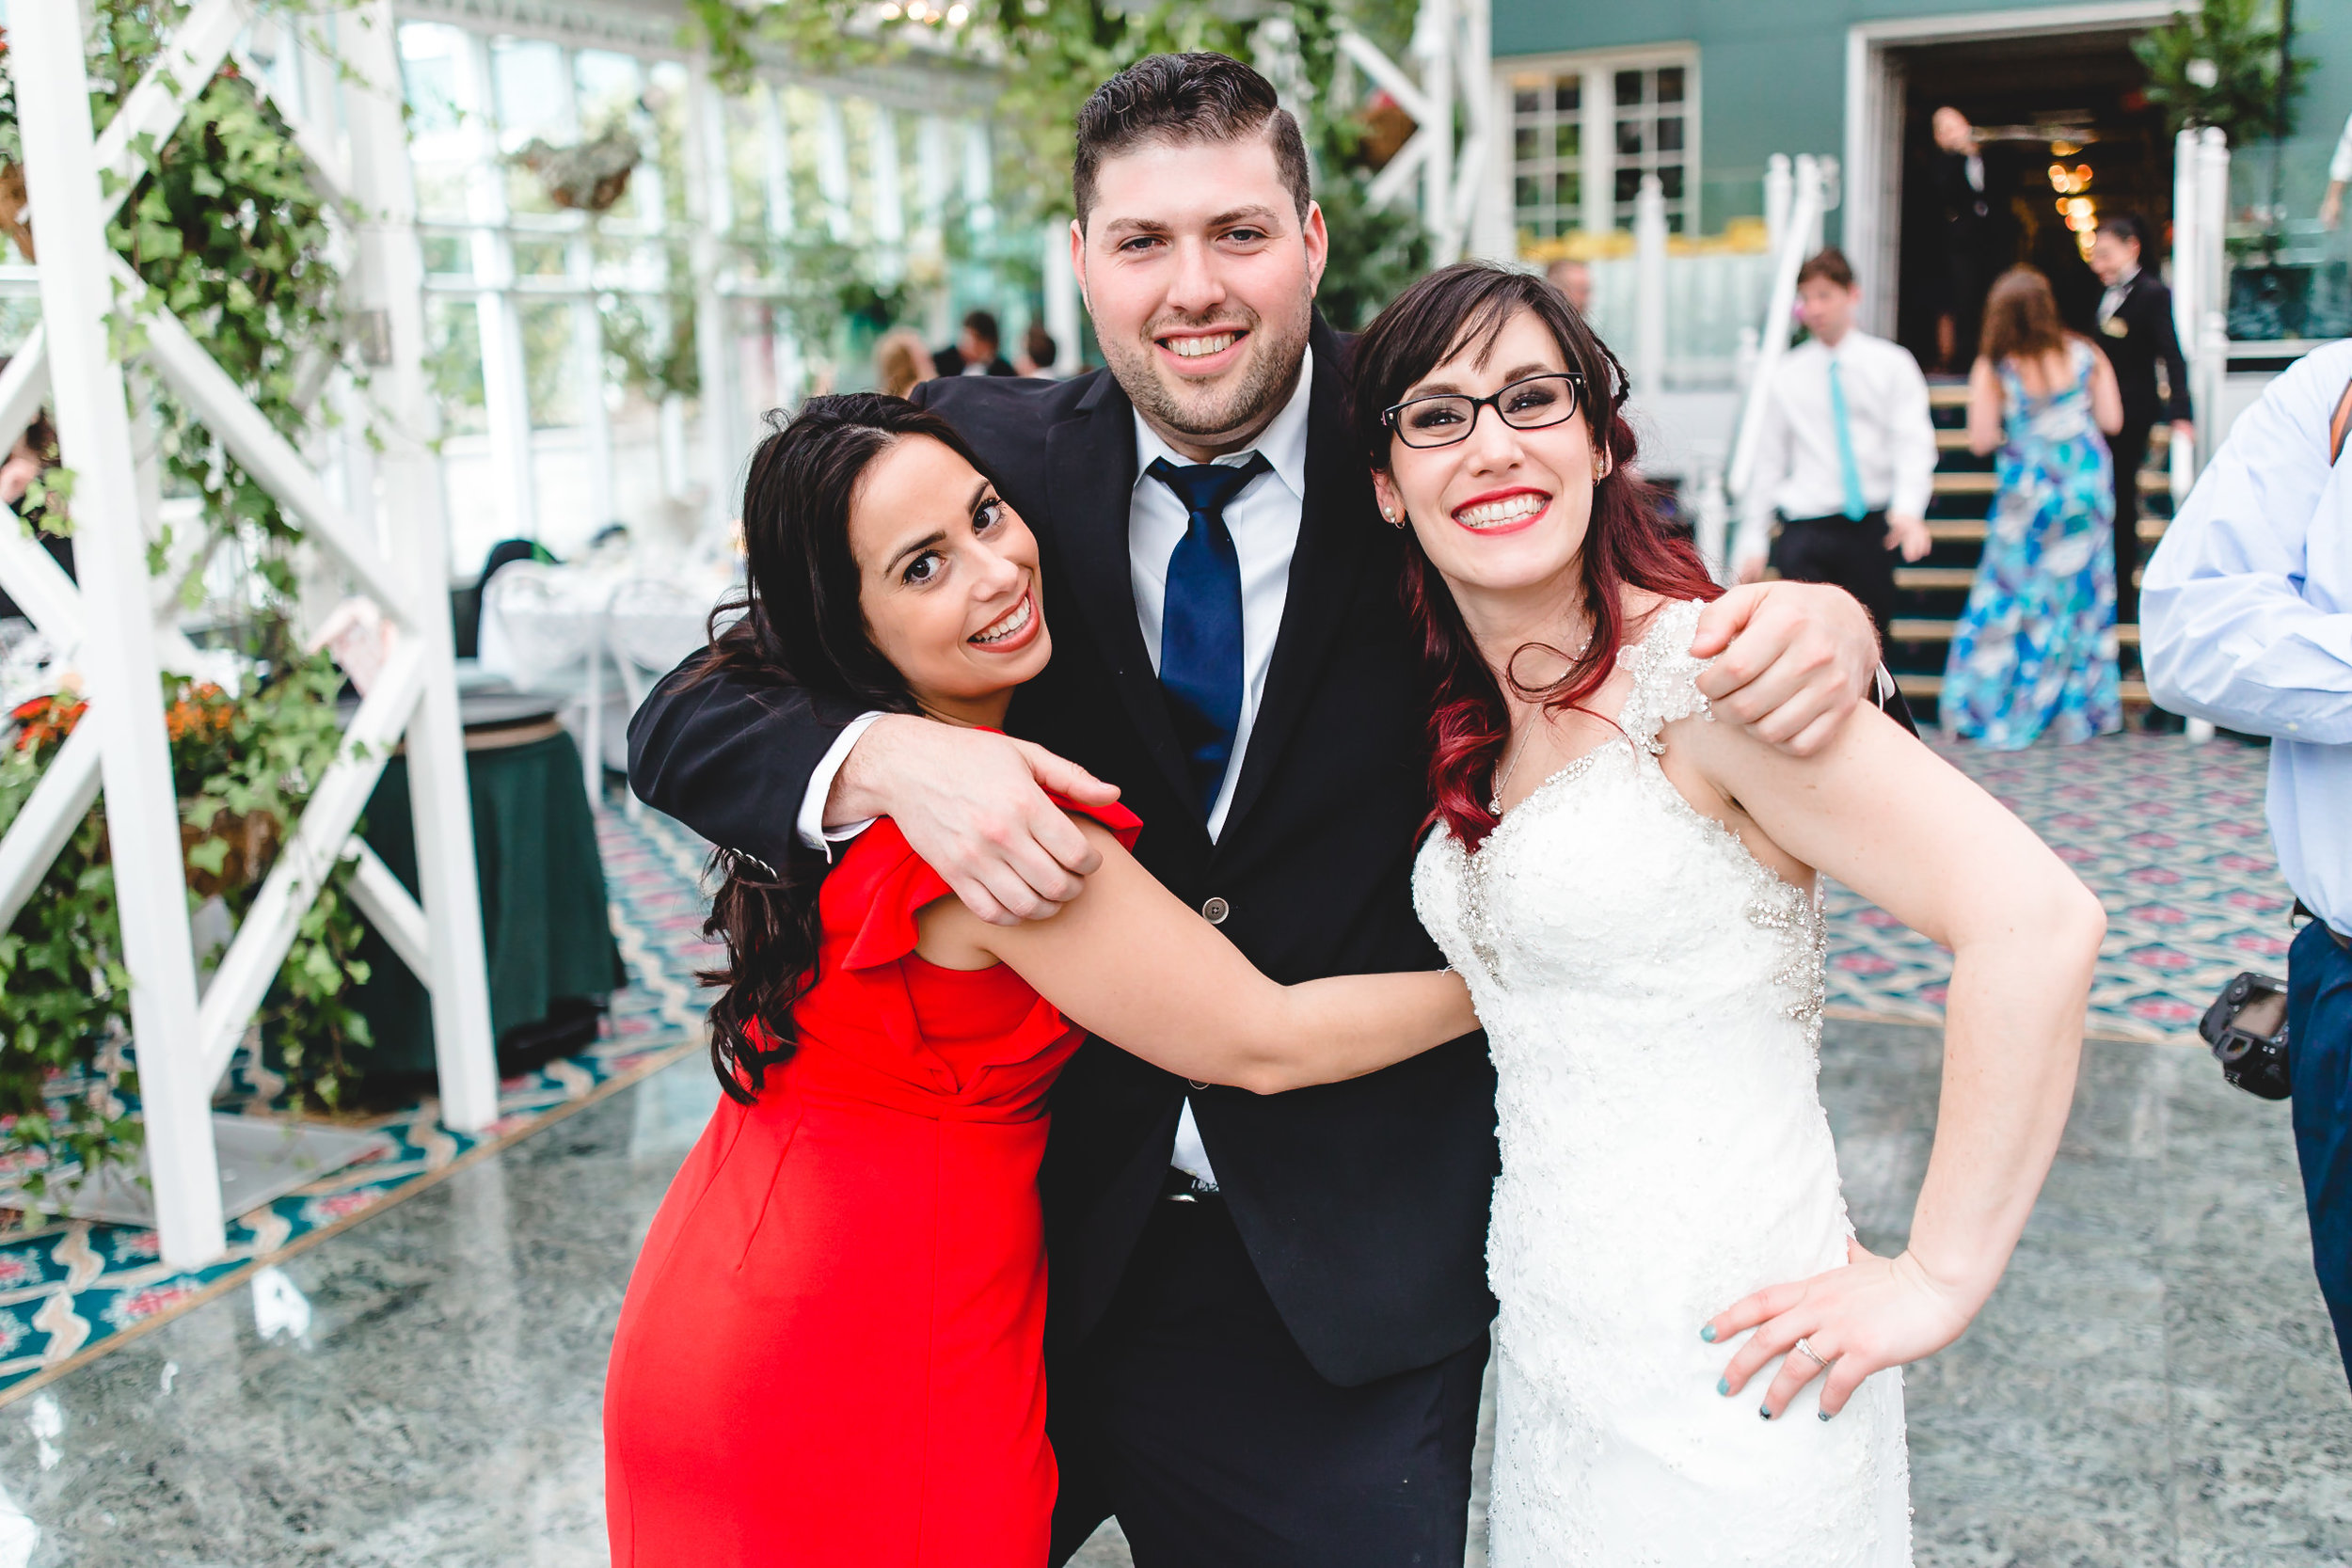 daniel_nydick_nj_photographer_headshot_wedding_event_family-34.jpg